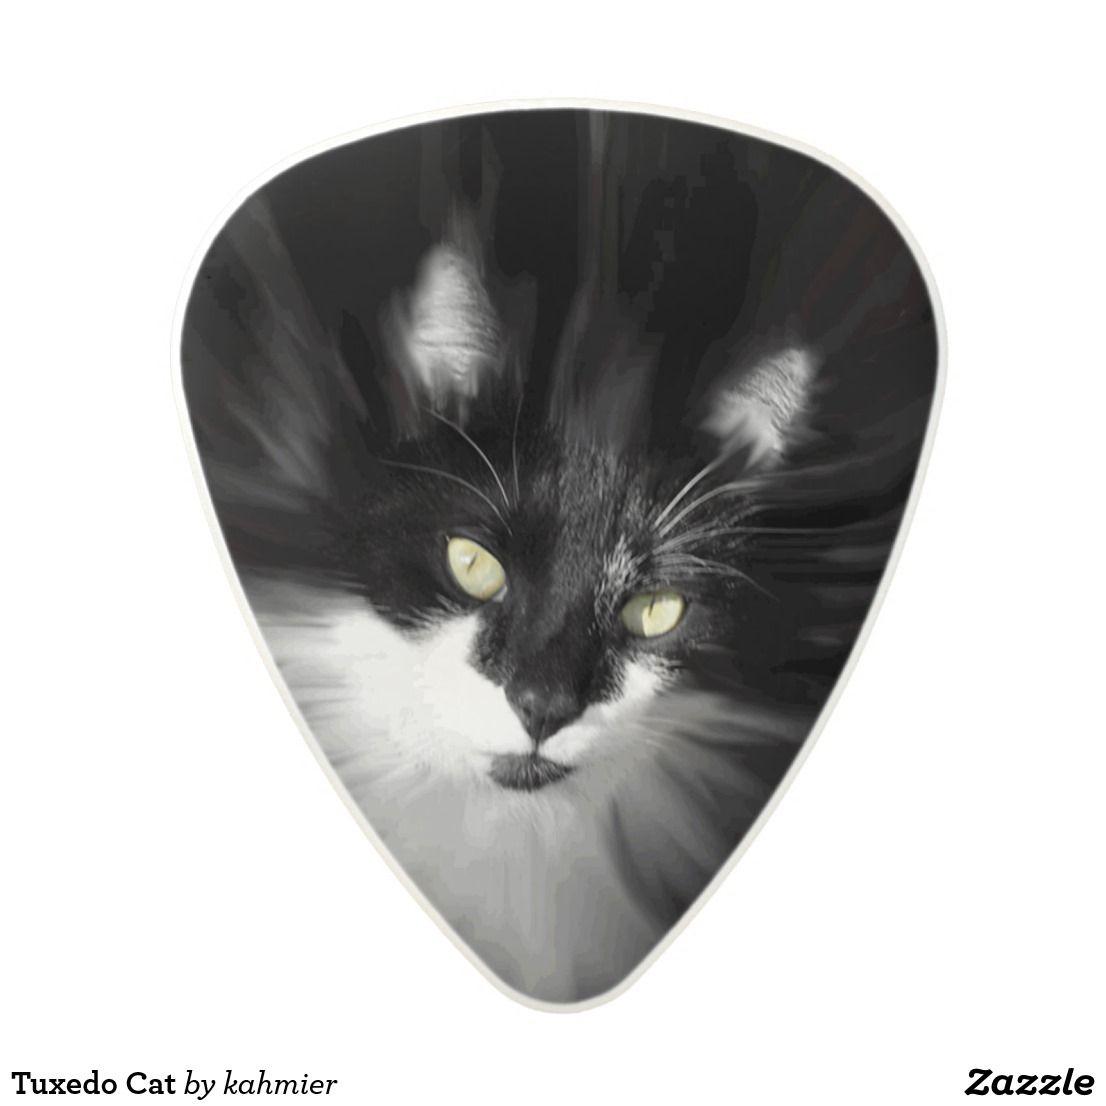 Tuxedo Cat Polycarbonate Guitar Pick